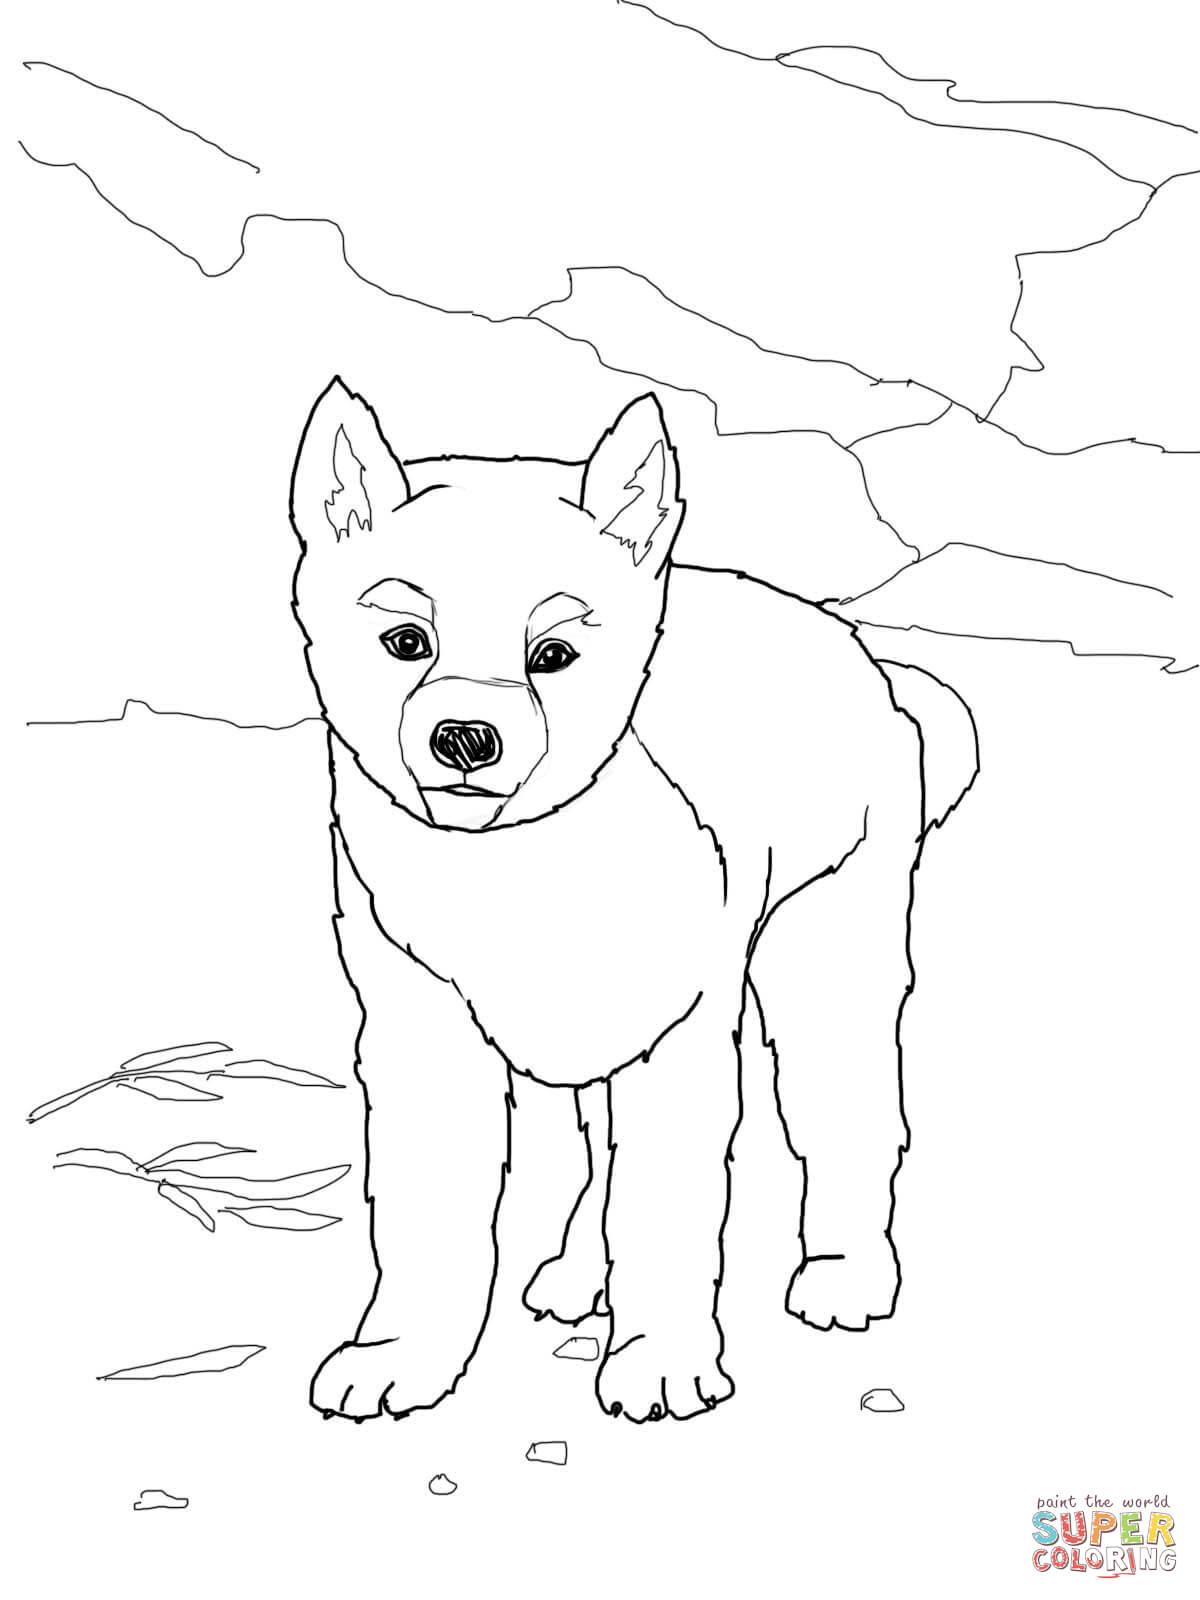 Dingo coloring #13, Download drawings